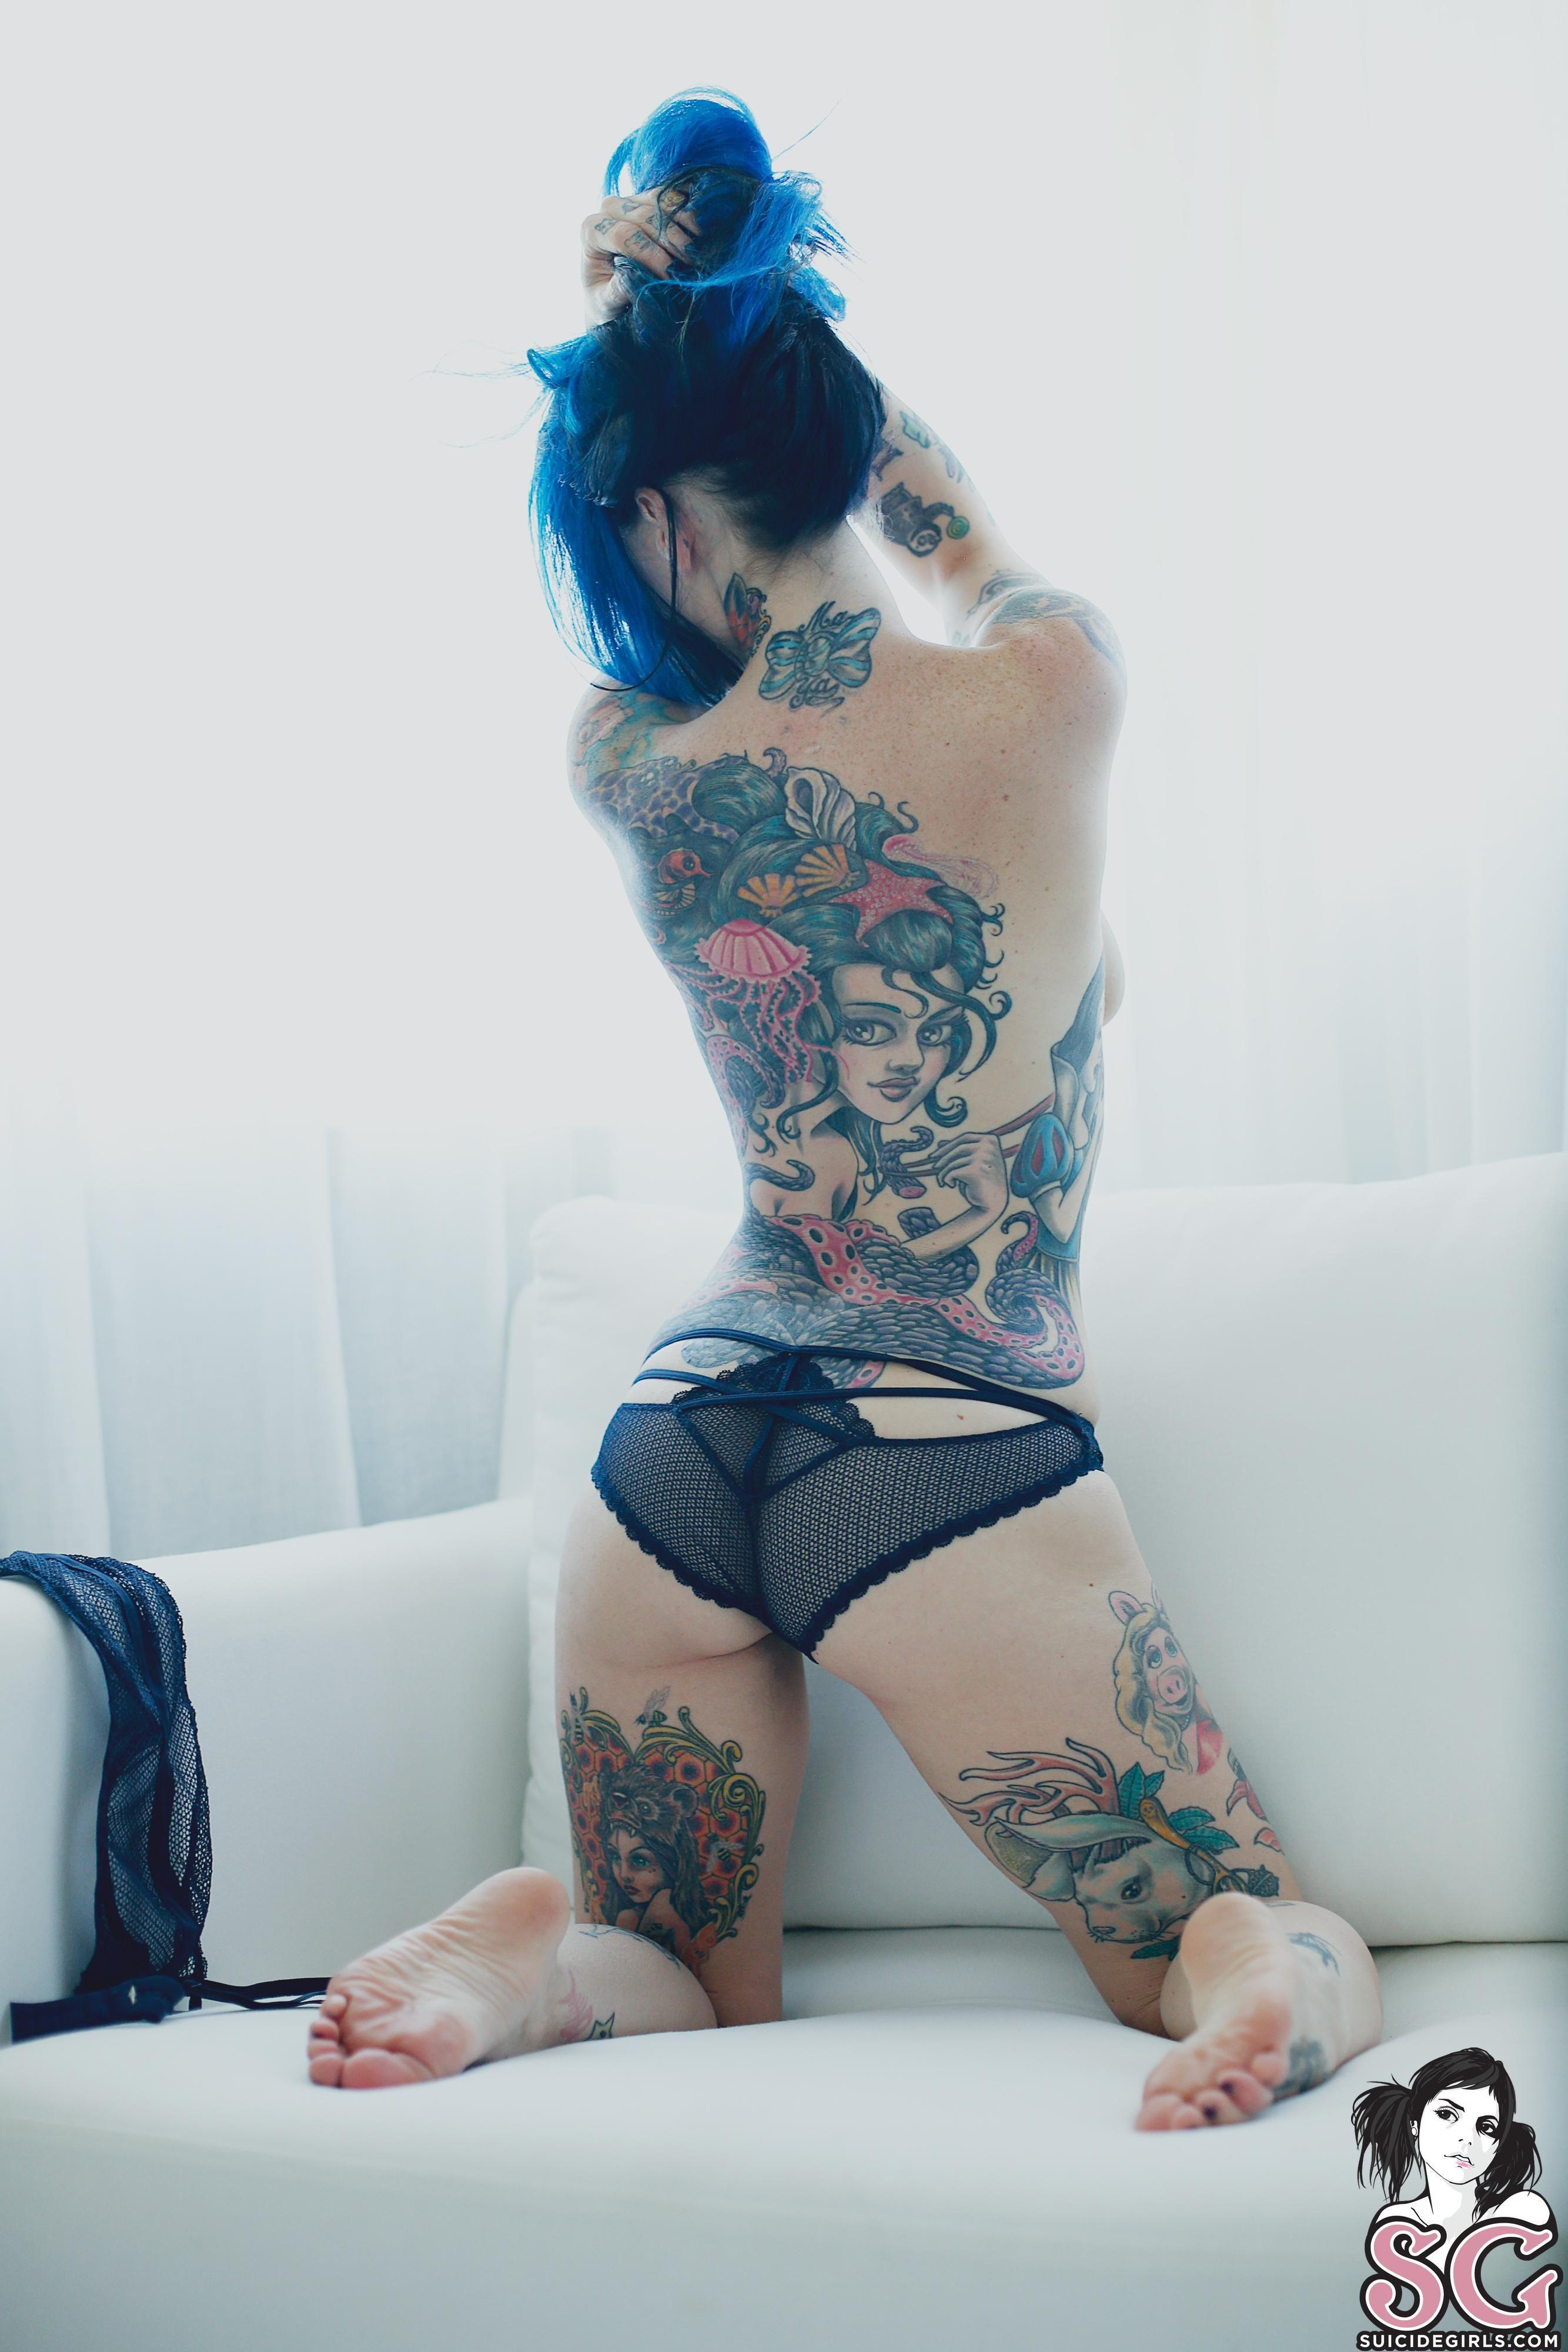 Horny girls online-8559